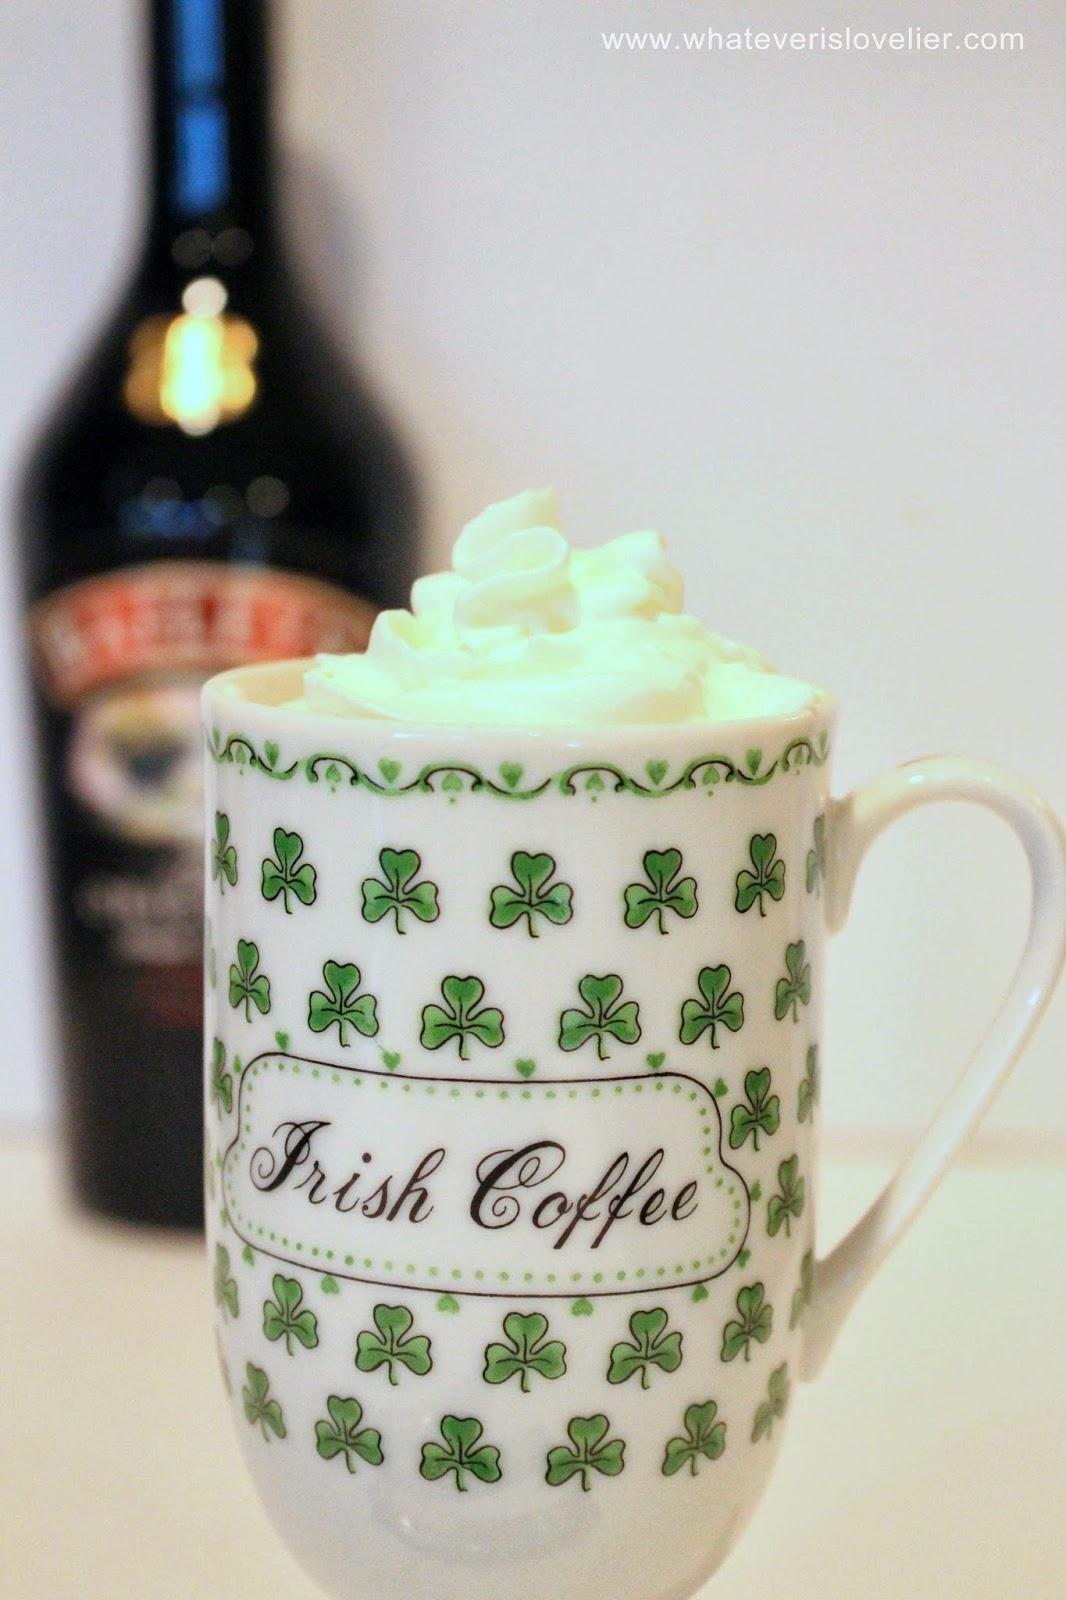 Celebrate St. Patty's Day with an Irish Coffee